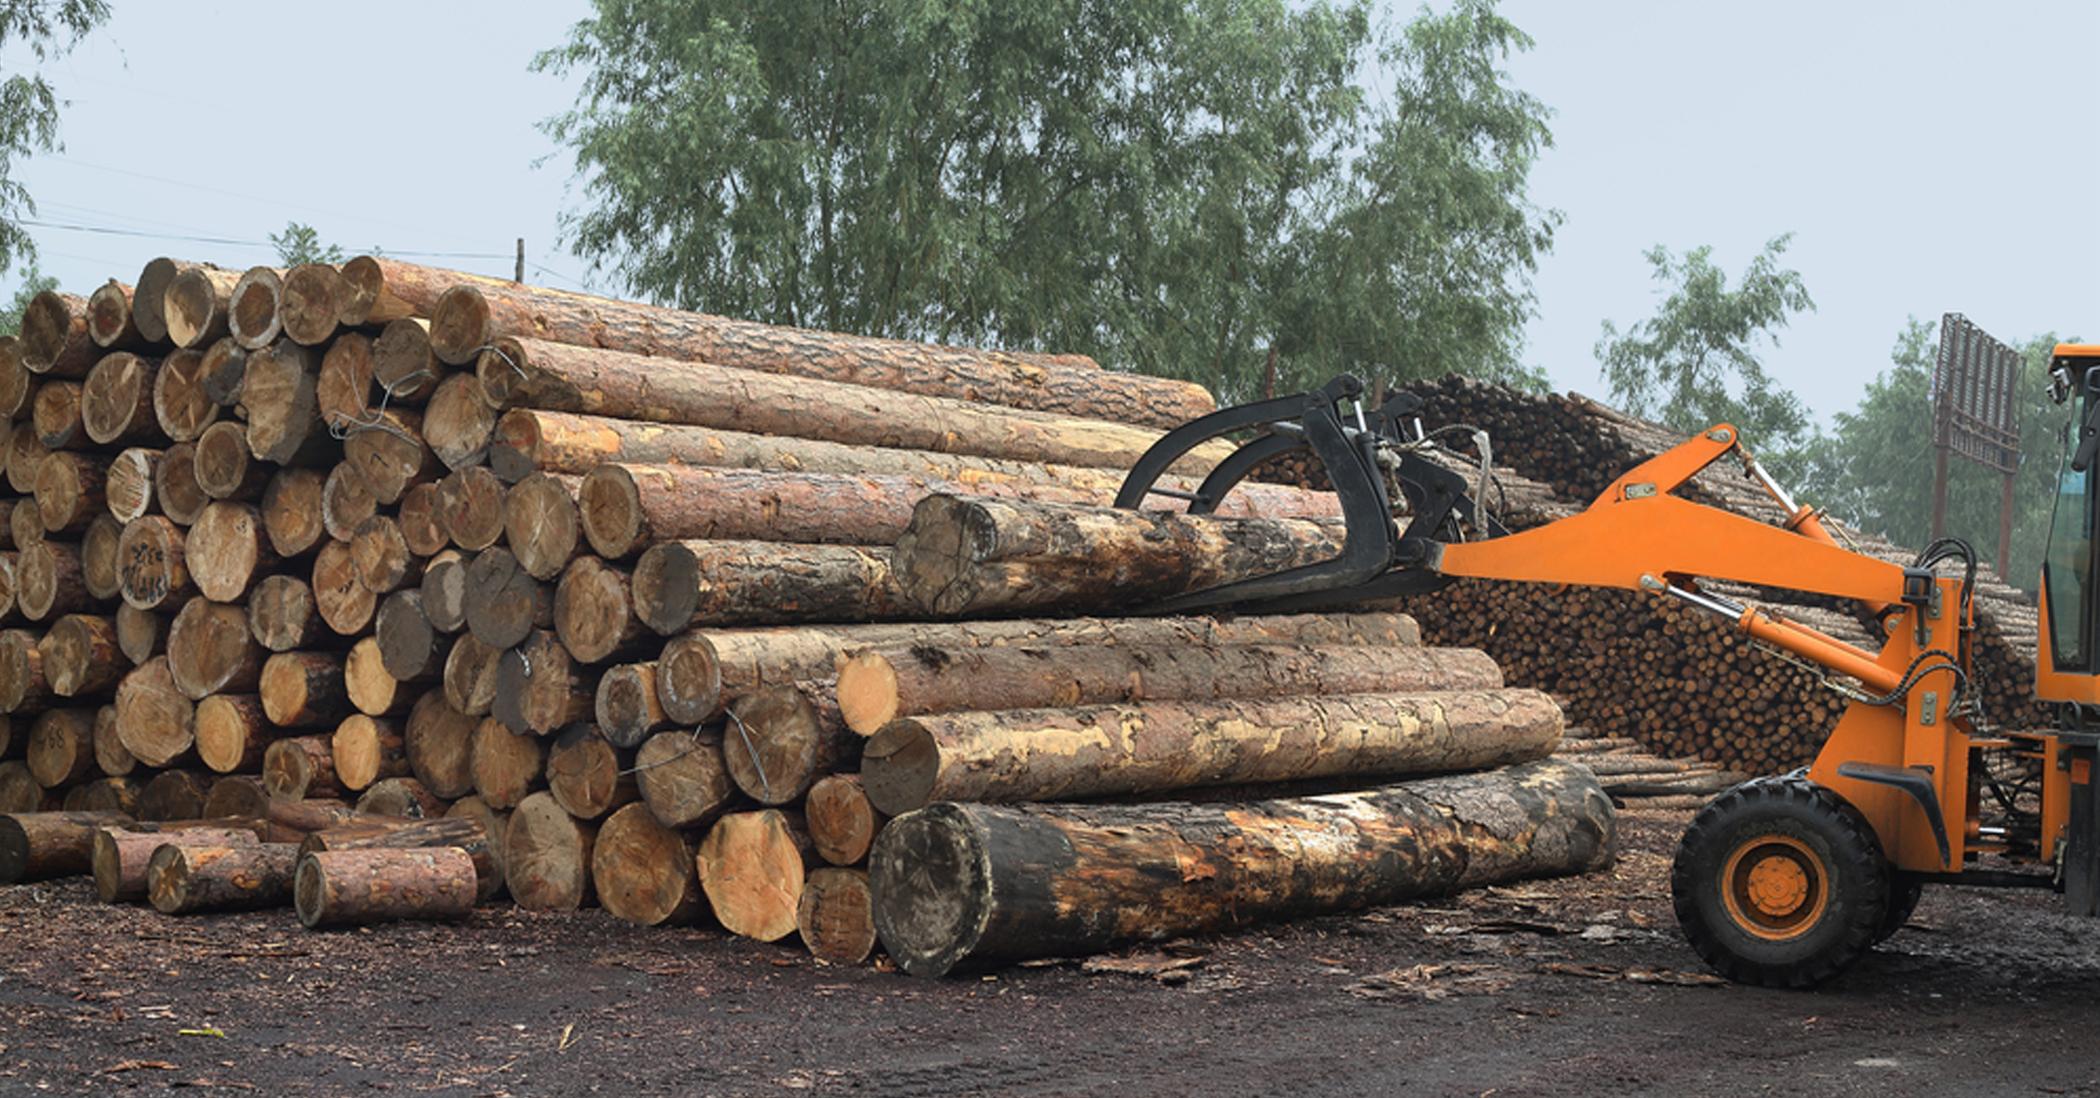 LaSalle Lumber equipment and logs image